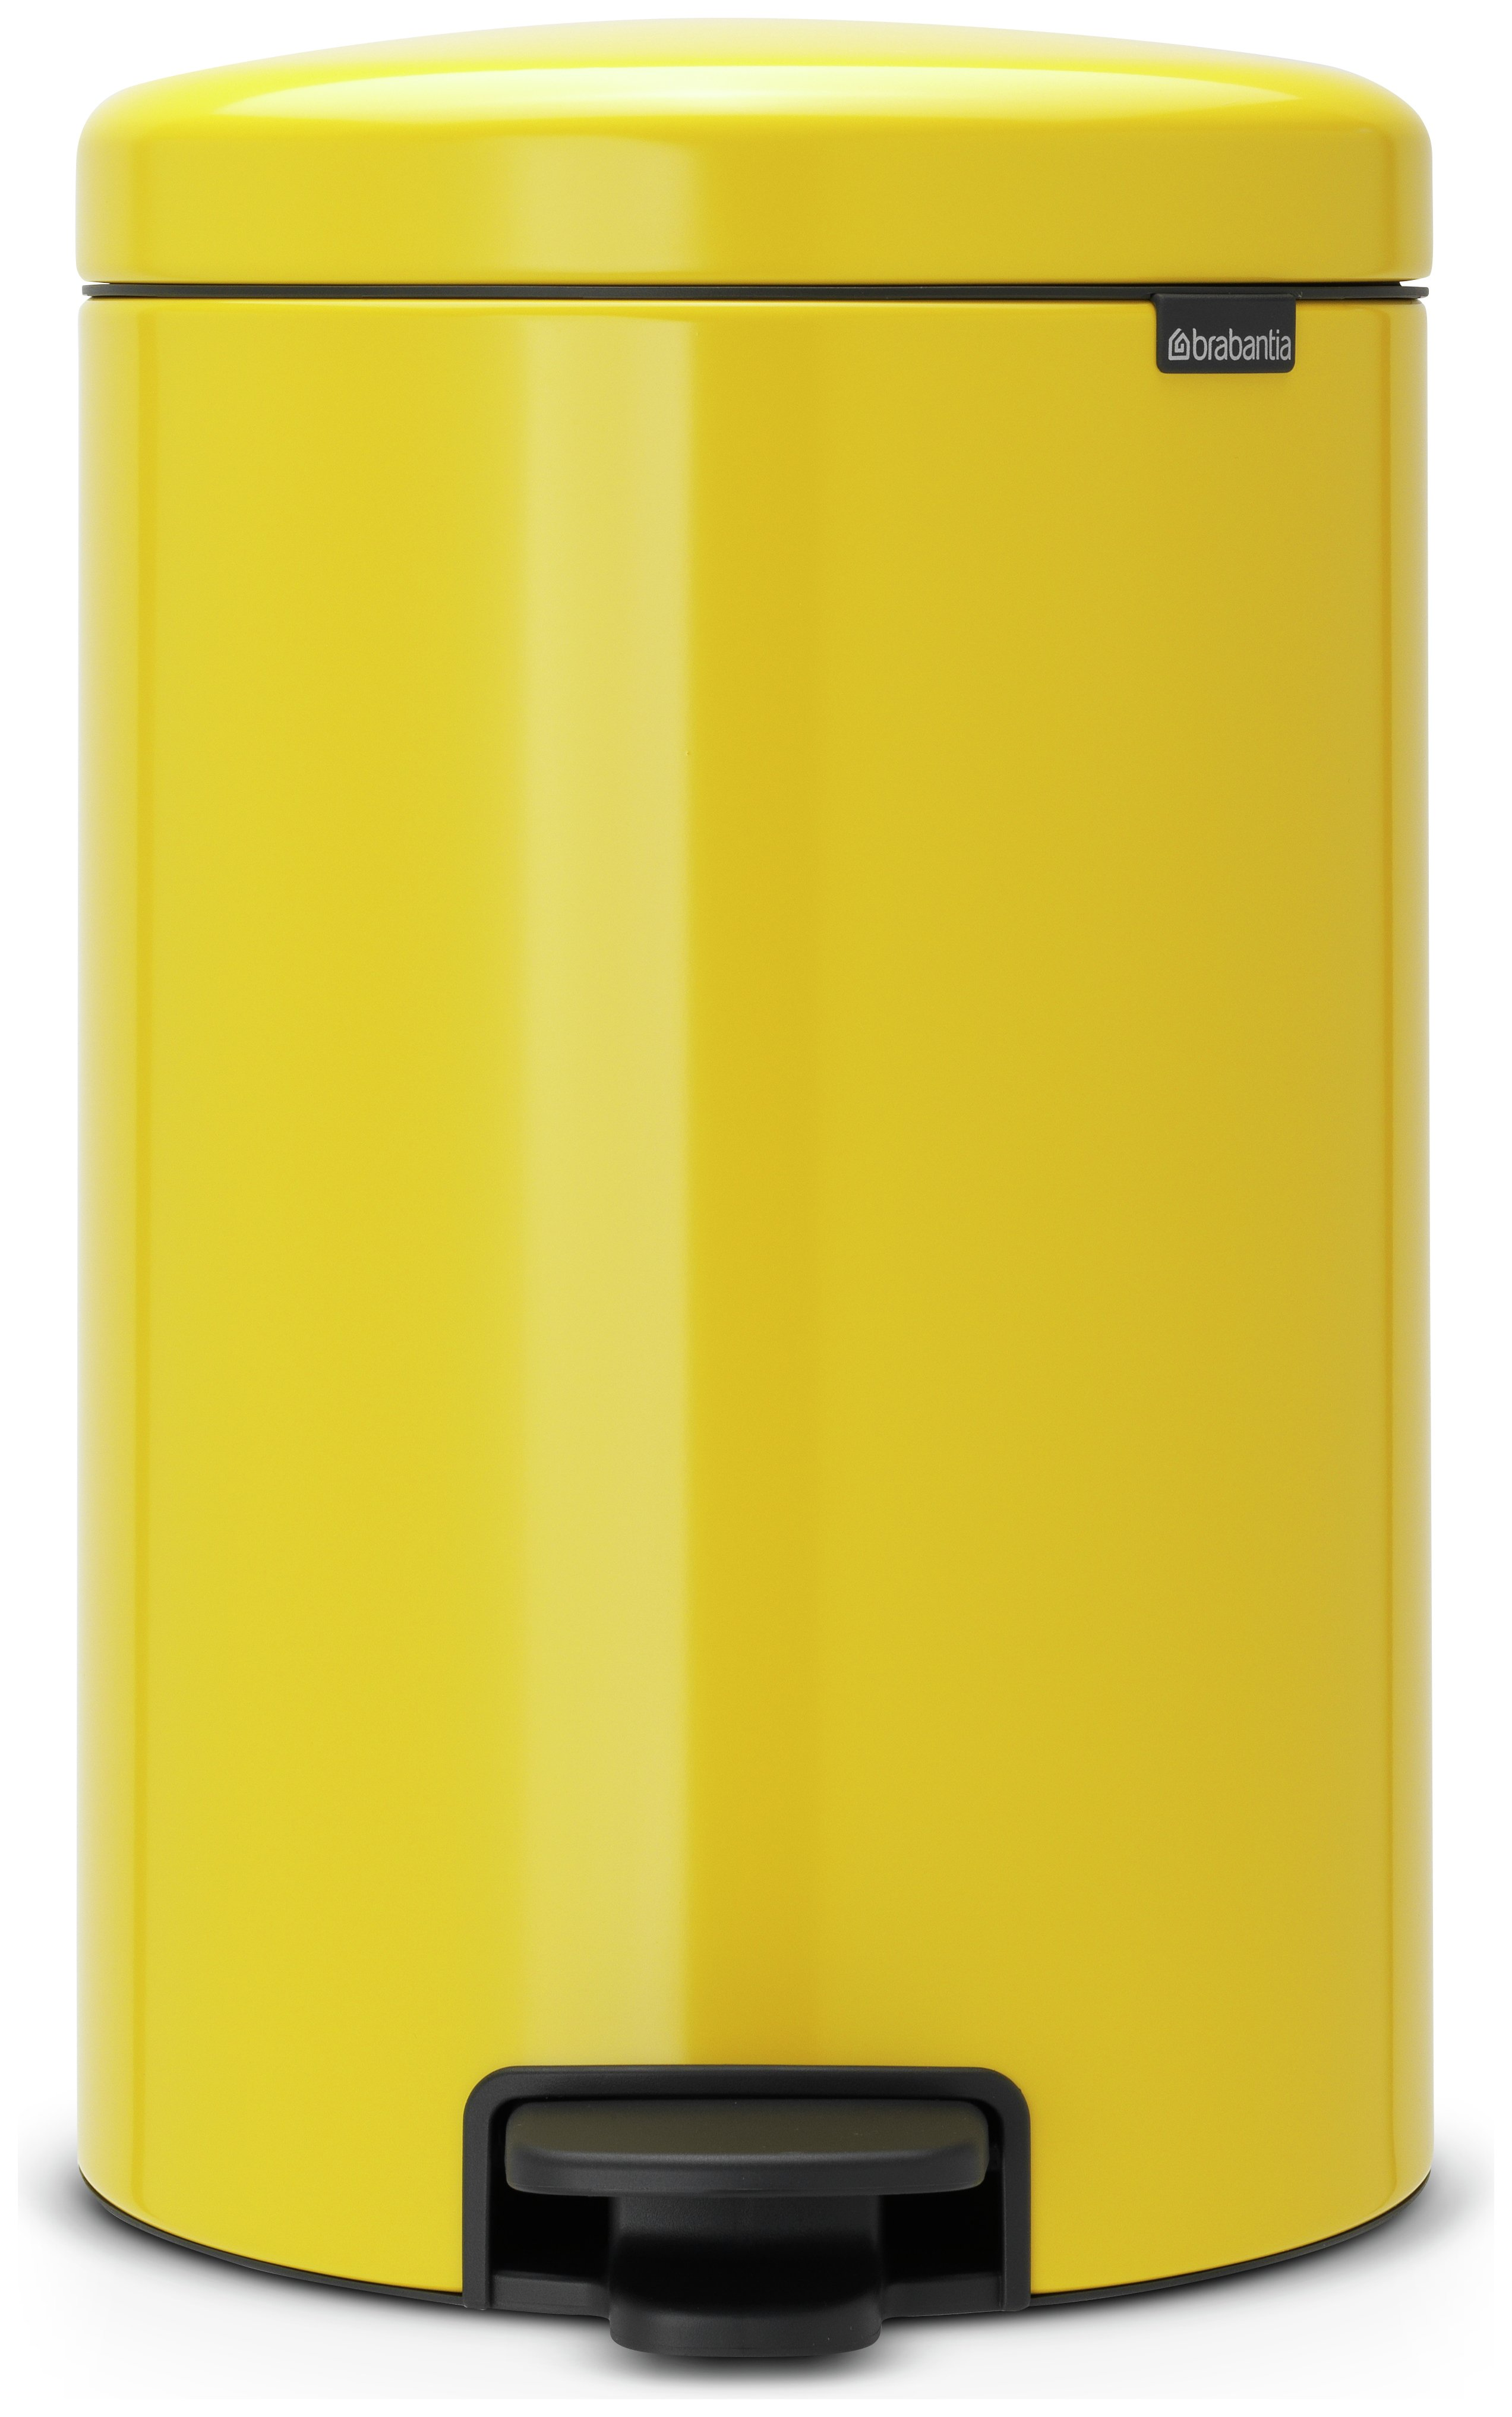 Brabantia newIcon 20 Litre Pedal Bin - Yellow.